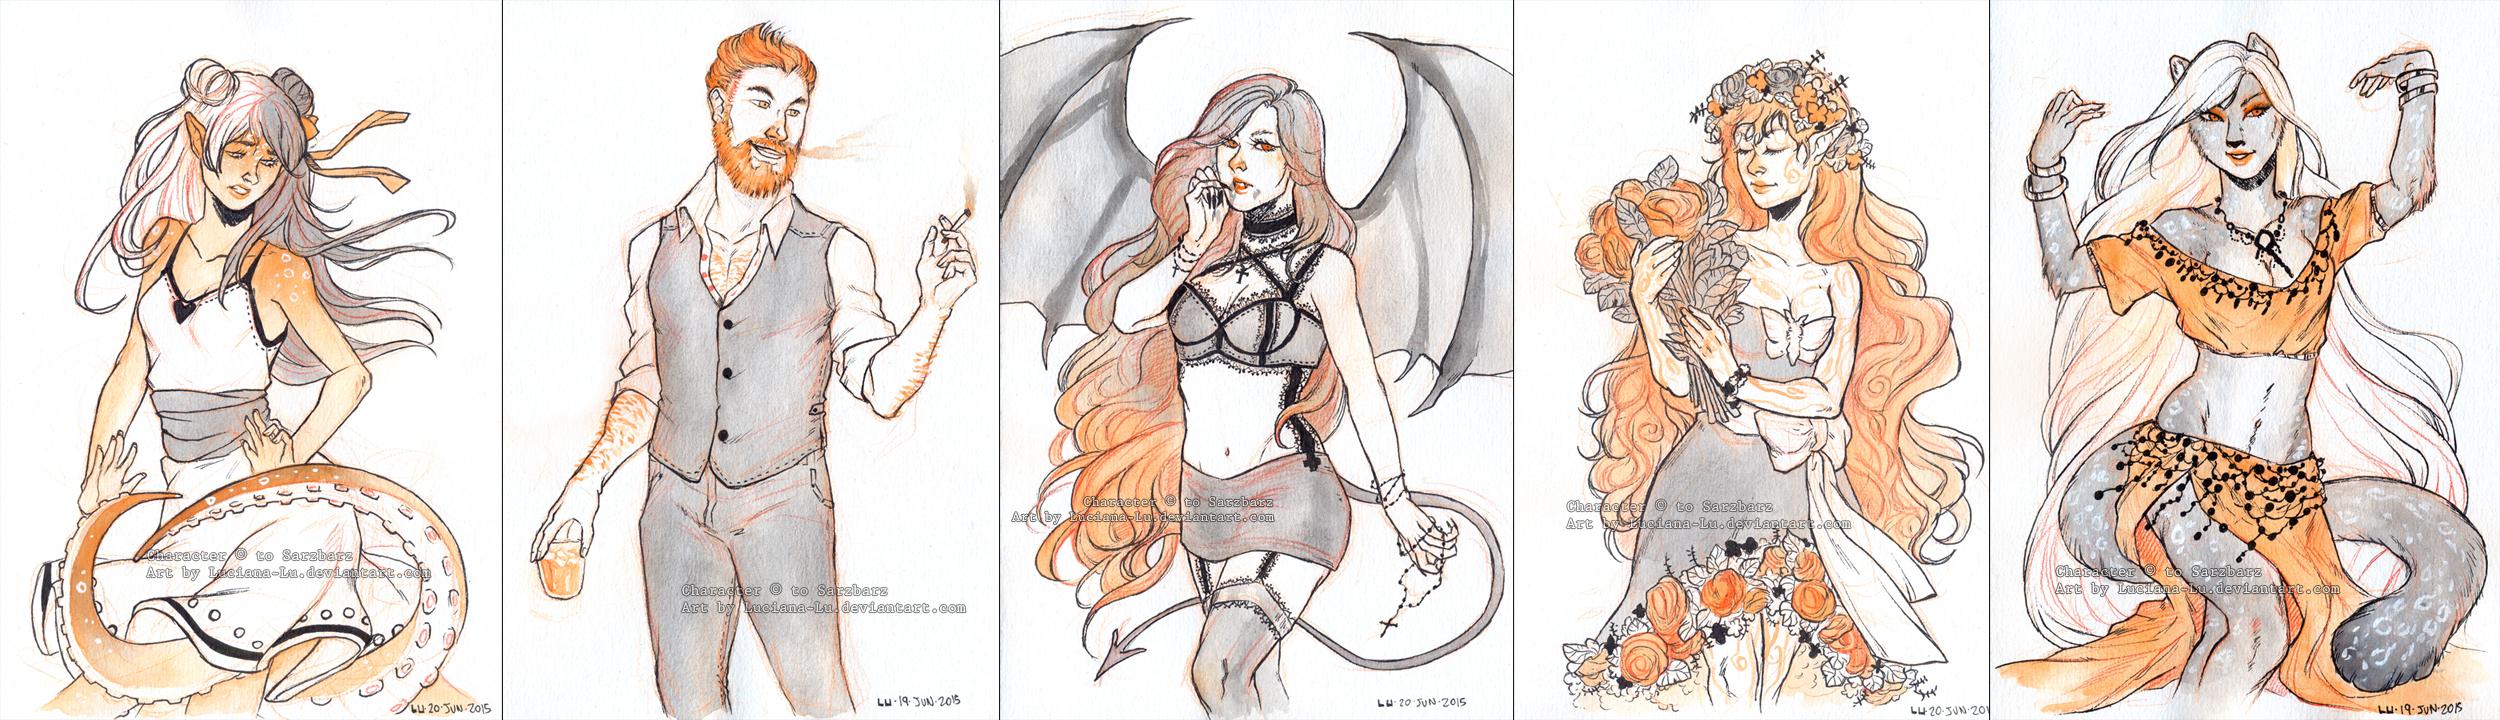 Iron Artist 3: 6-10 by Luciana-Lu